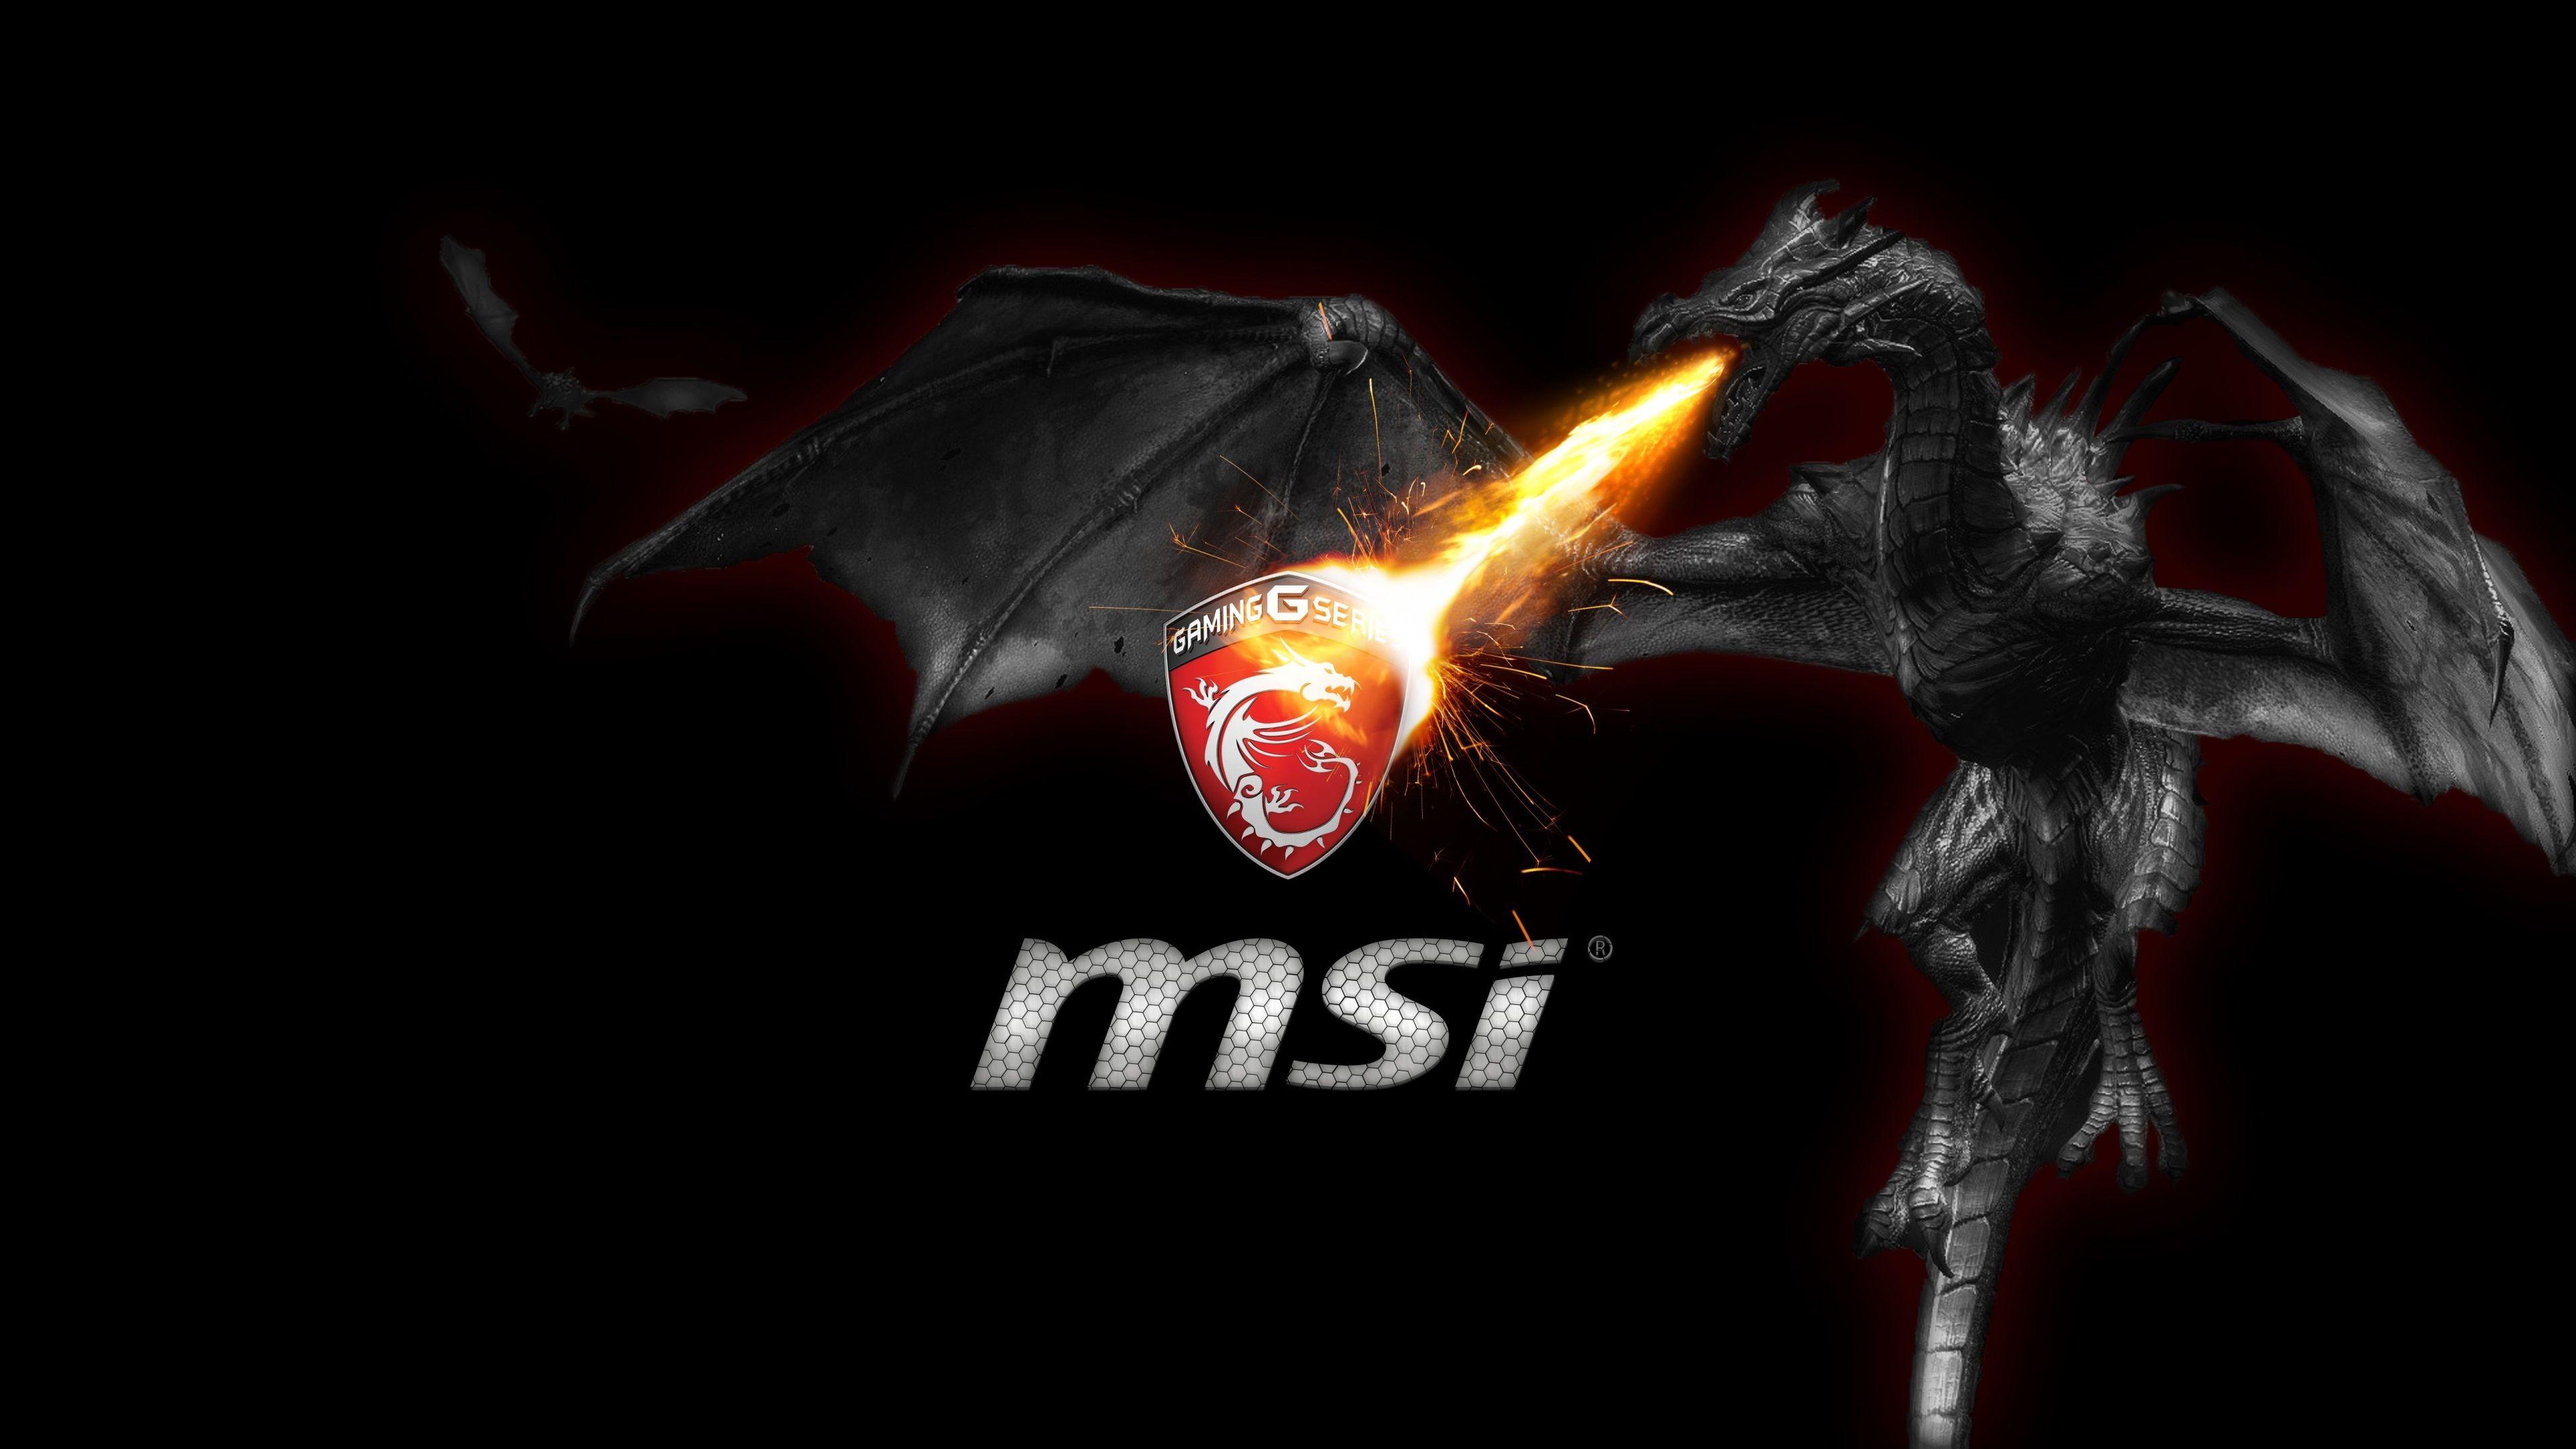 3840x2160 Msi 4k Wallpaper For Desktop Msi Msi Logo Desktop Wallpaper